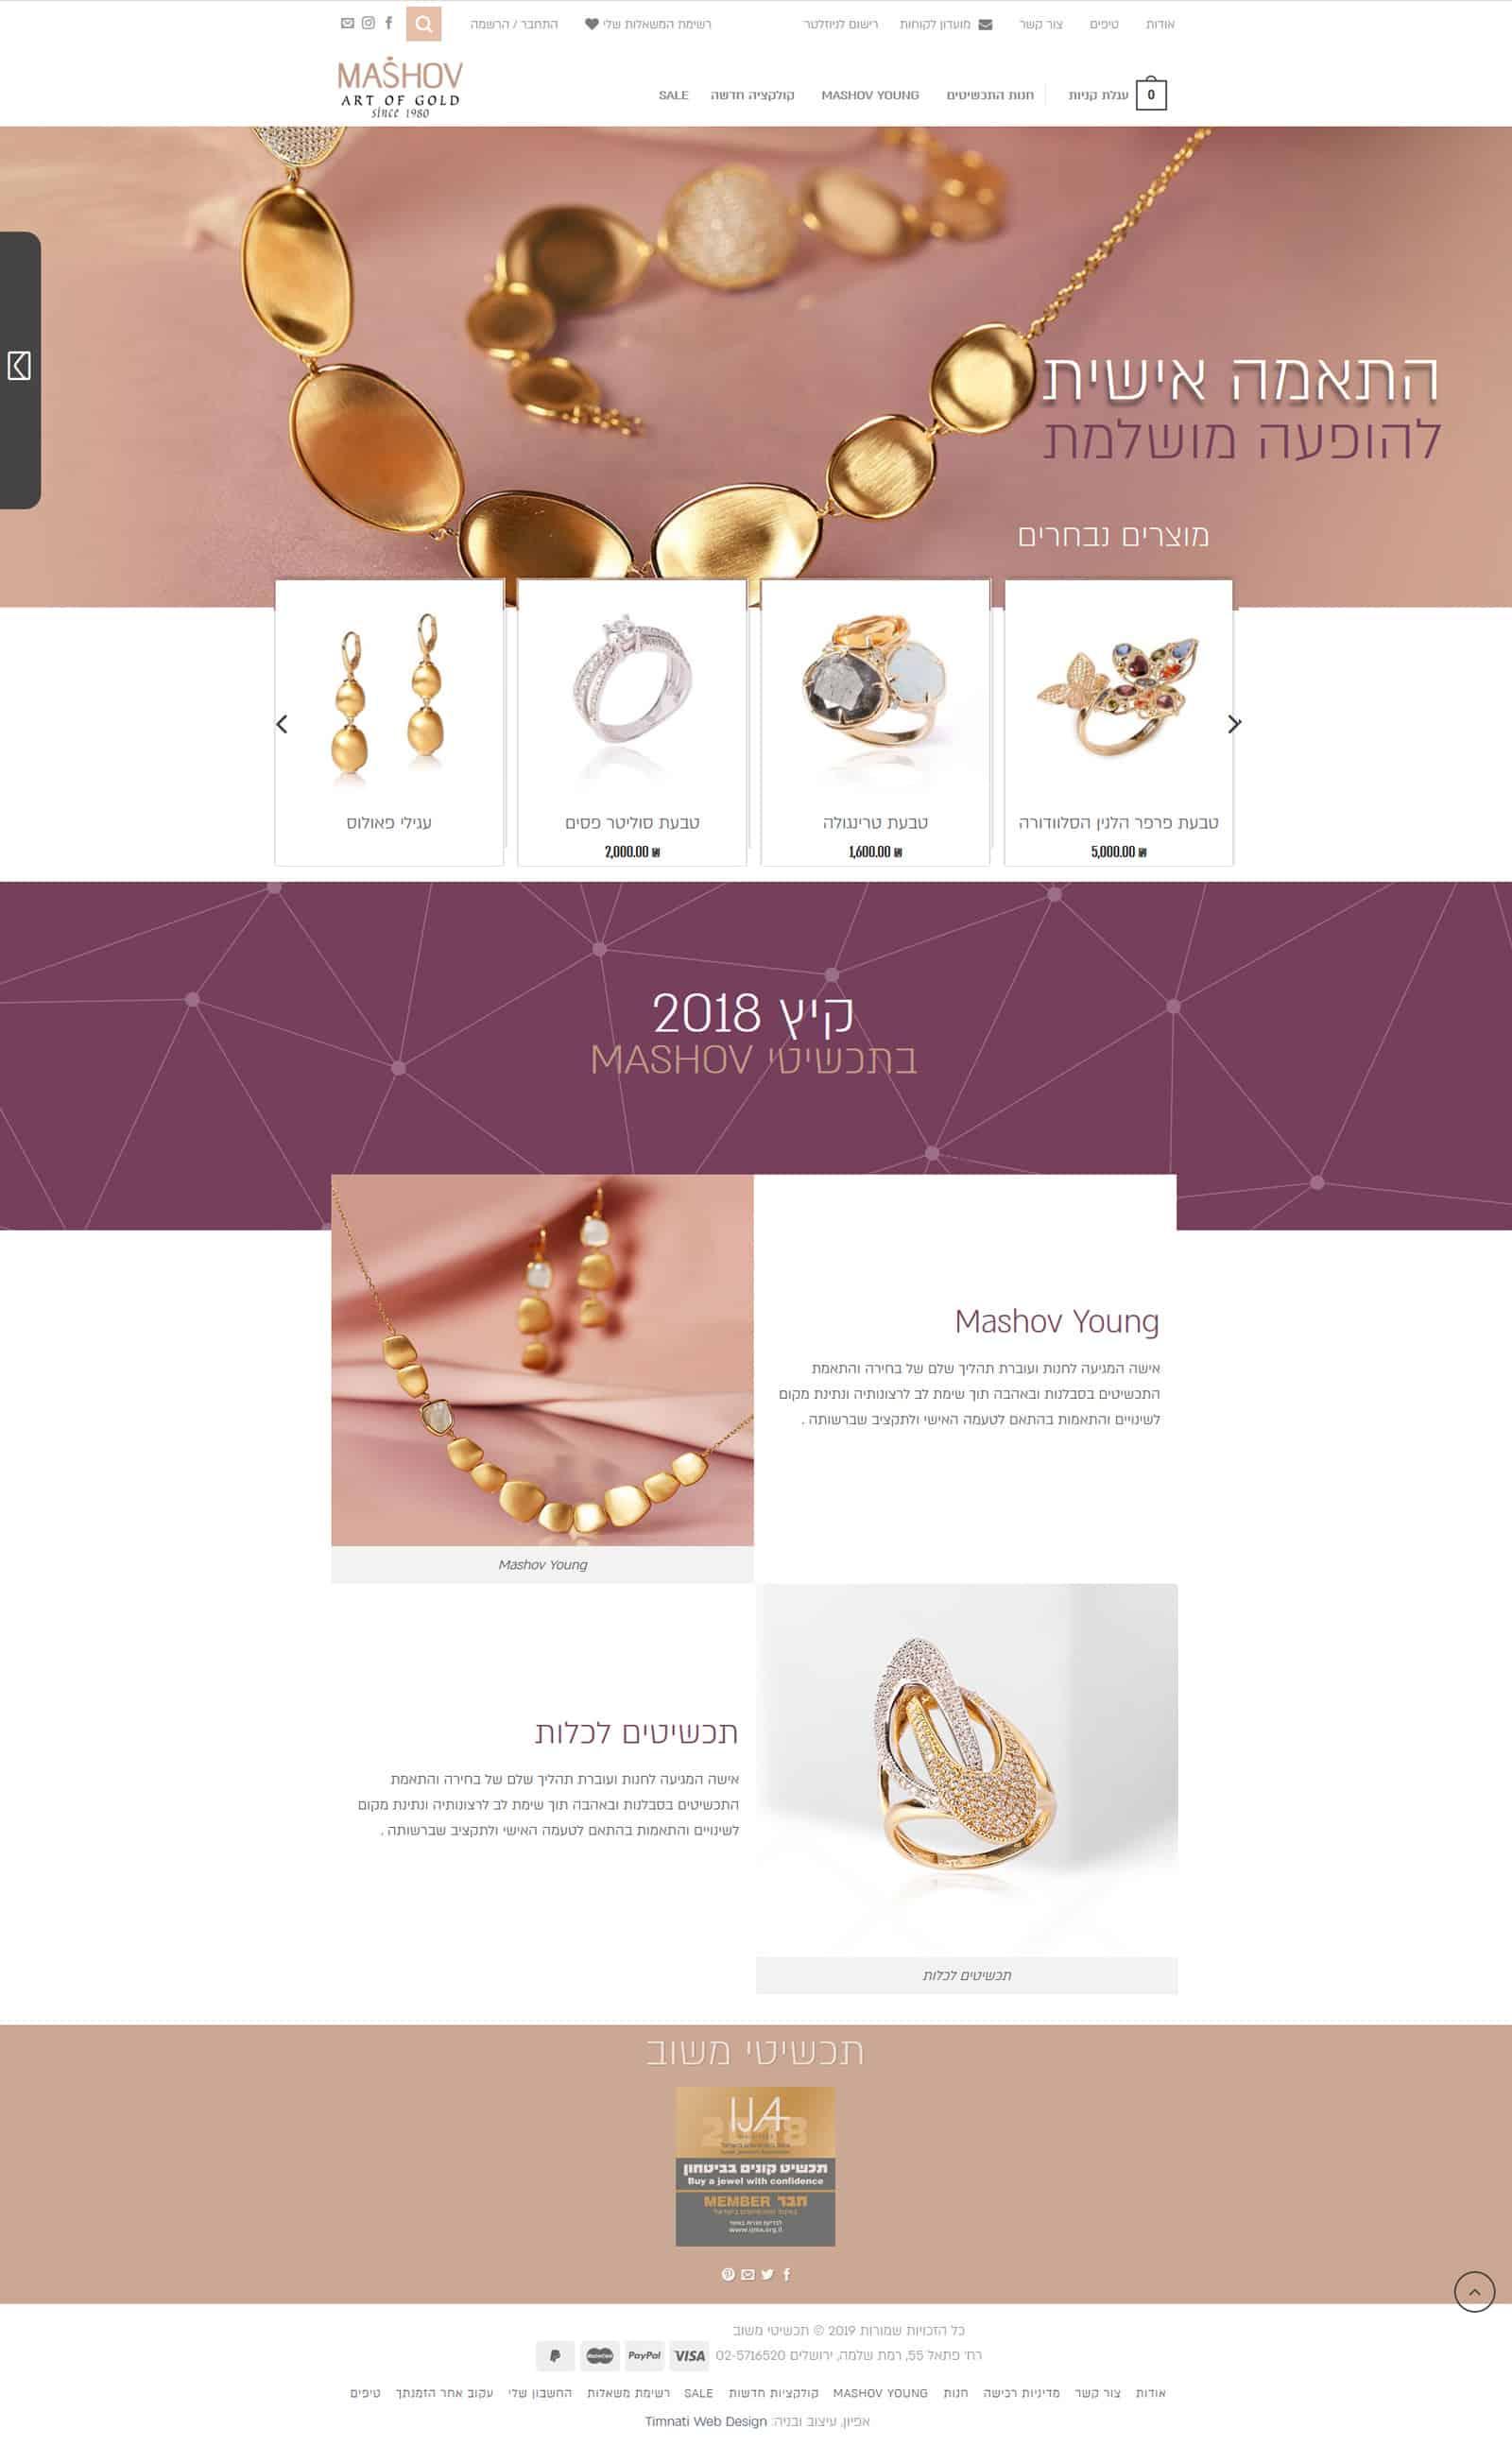 mashov-jewelry-main-page